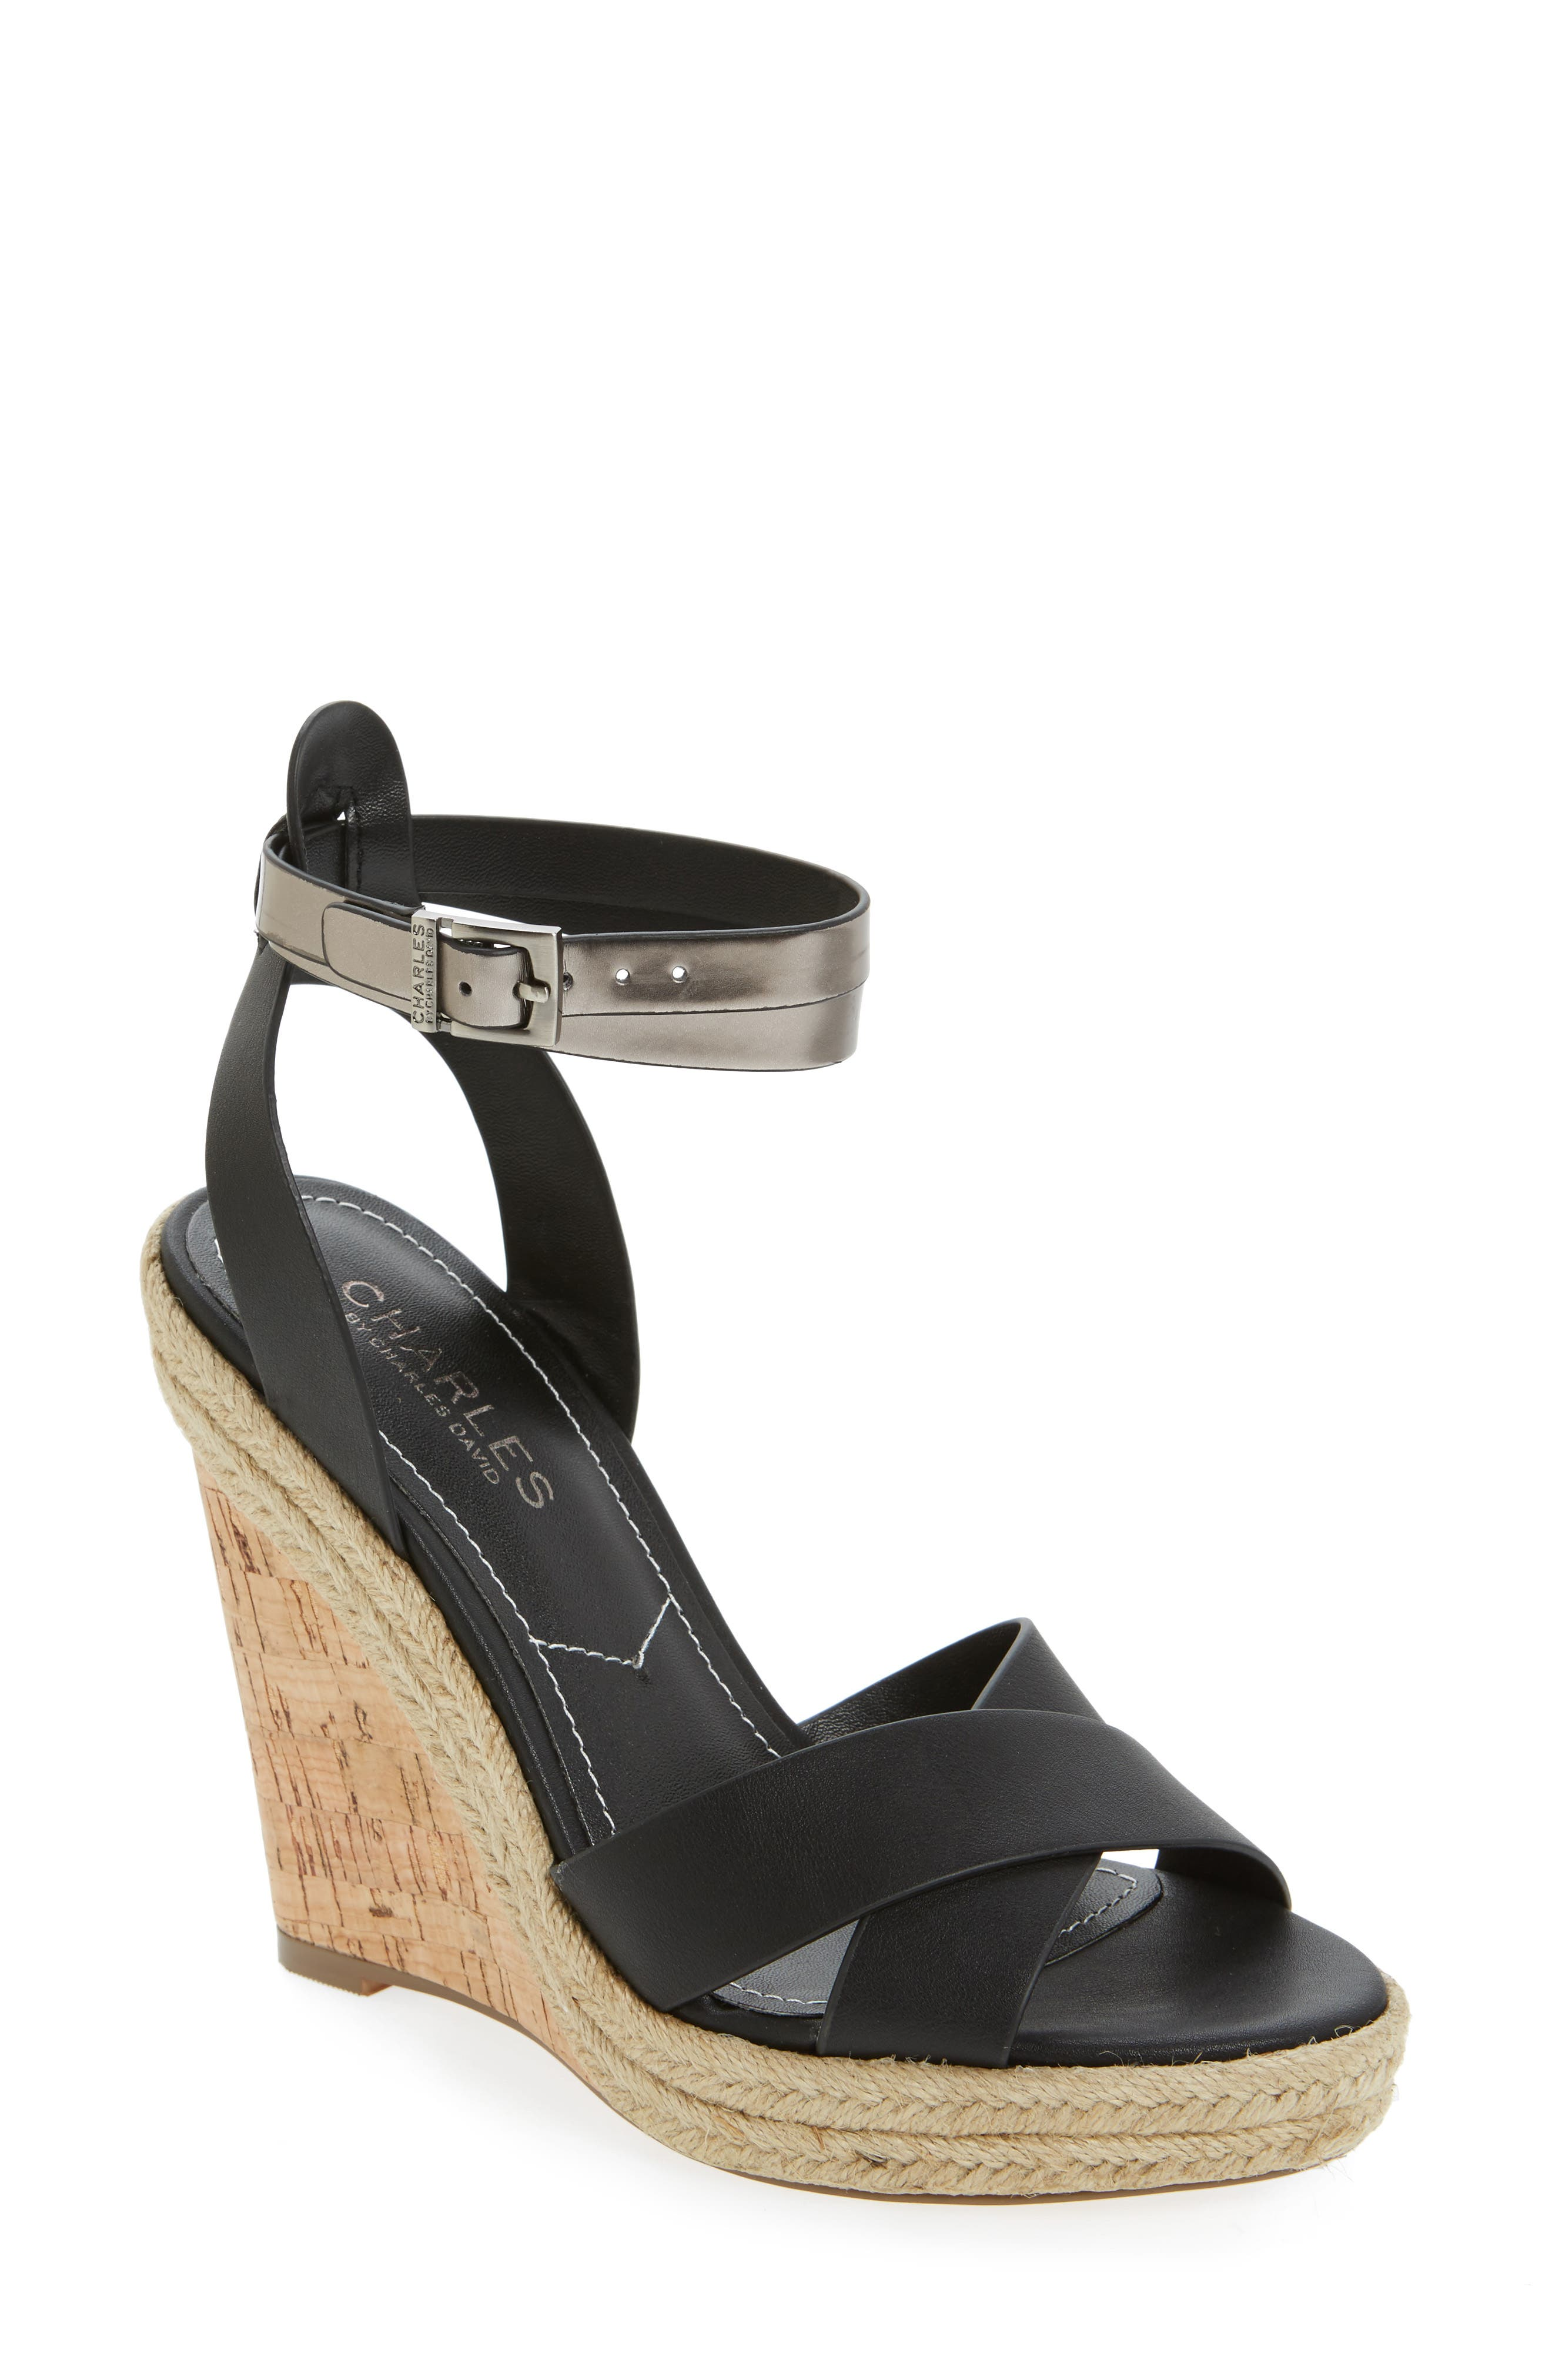 Brit Wedge Platform Sandal,                         Main,                         color, Black/ Gunmetal